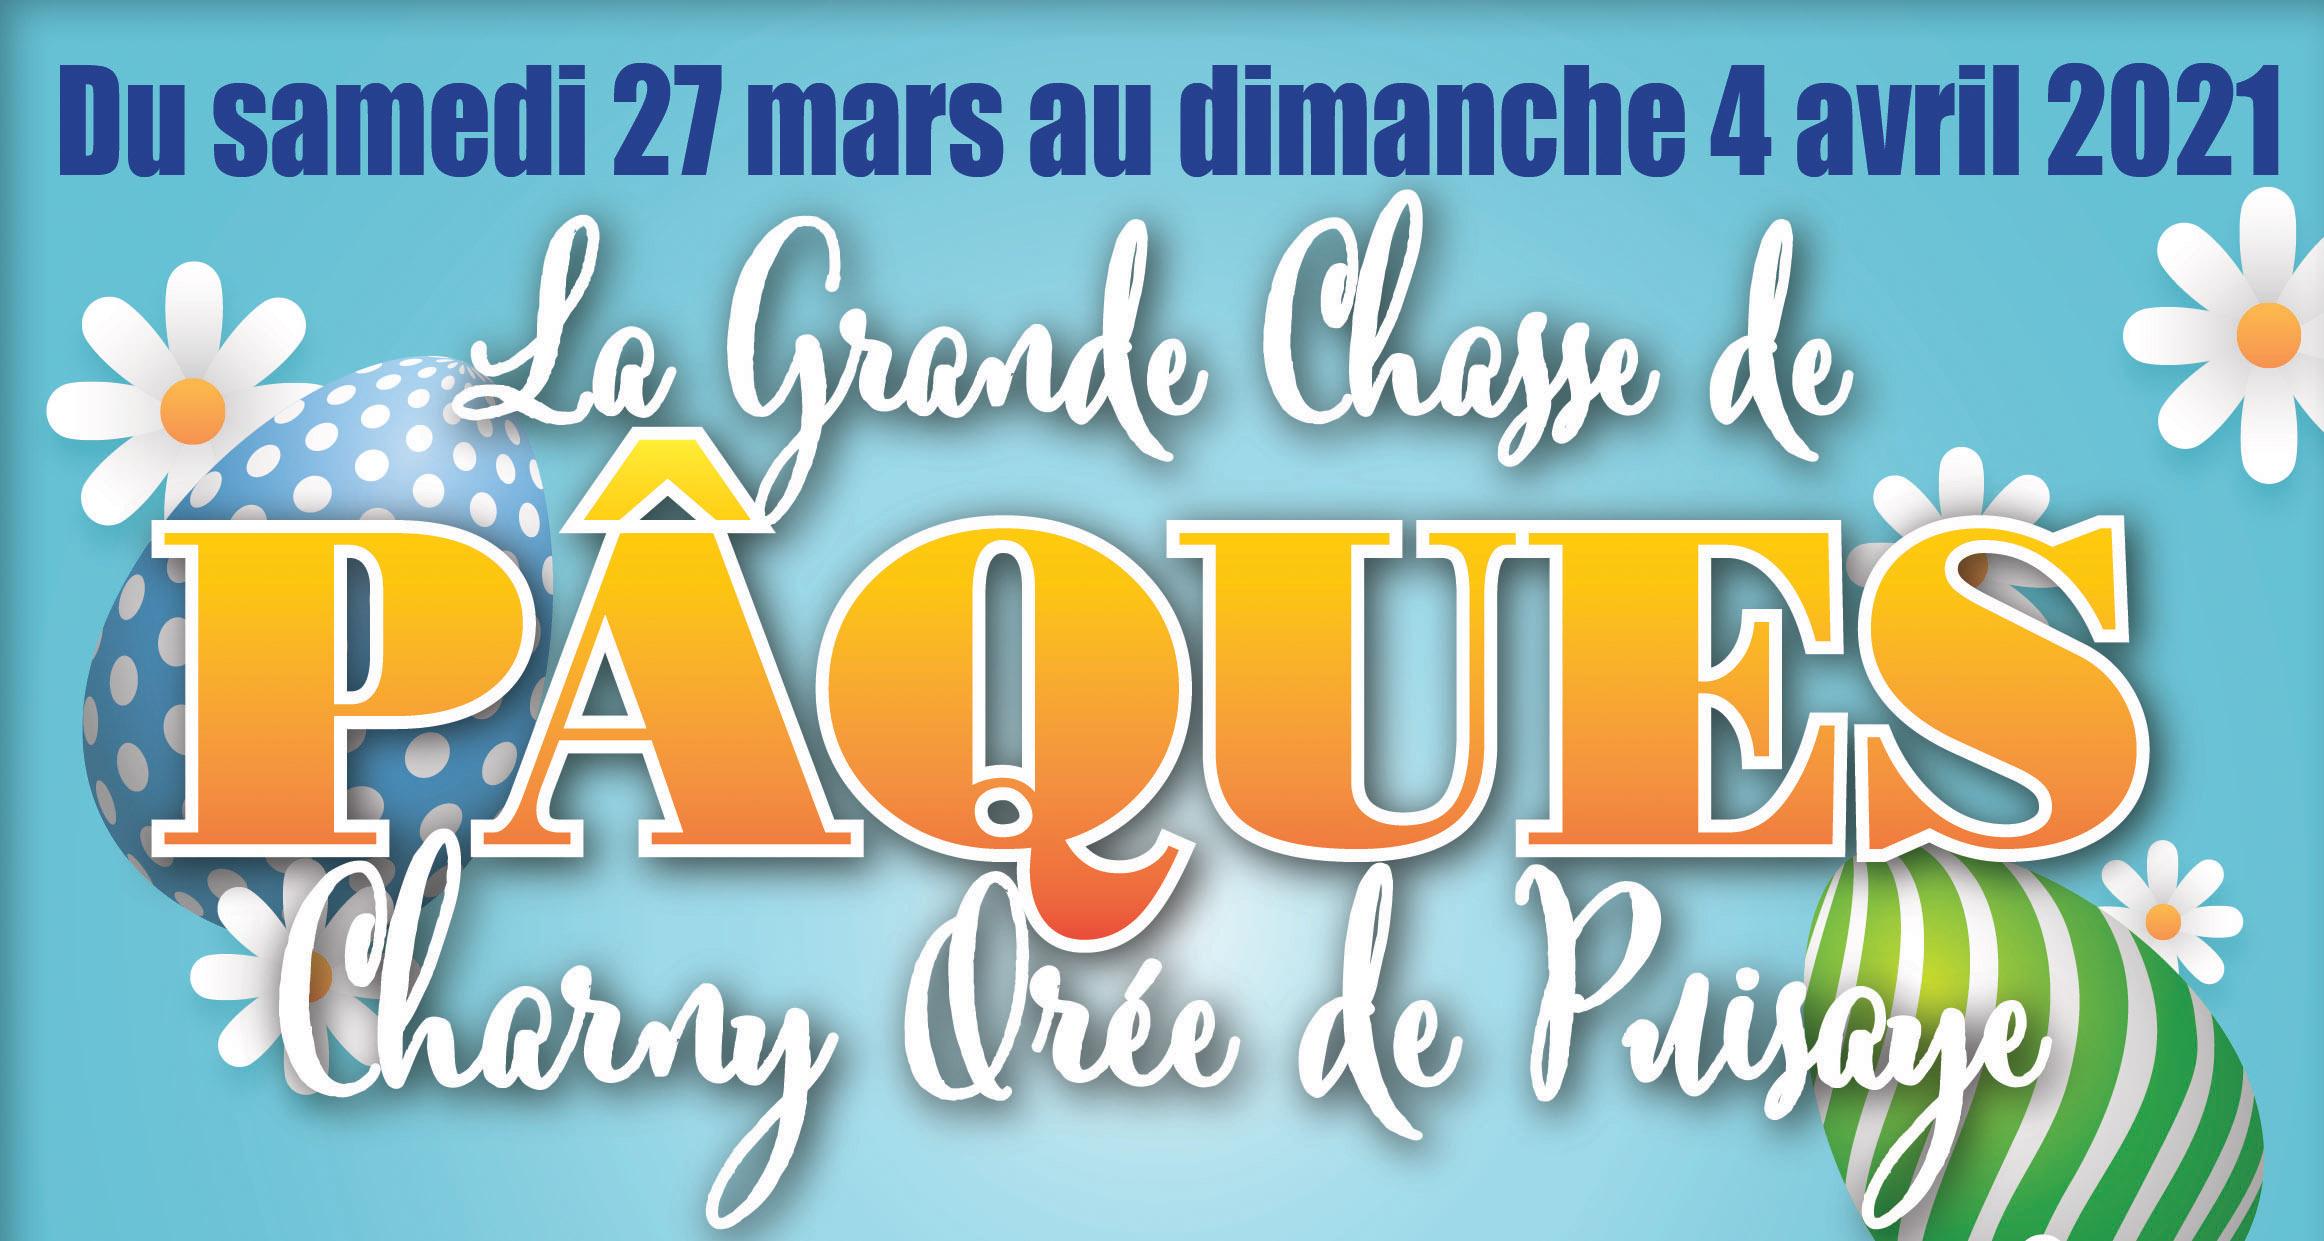 La Grande Chasse de Pâques Charny Orée de Puisaye